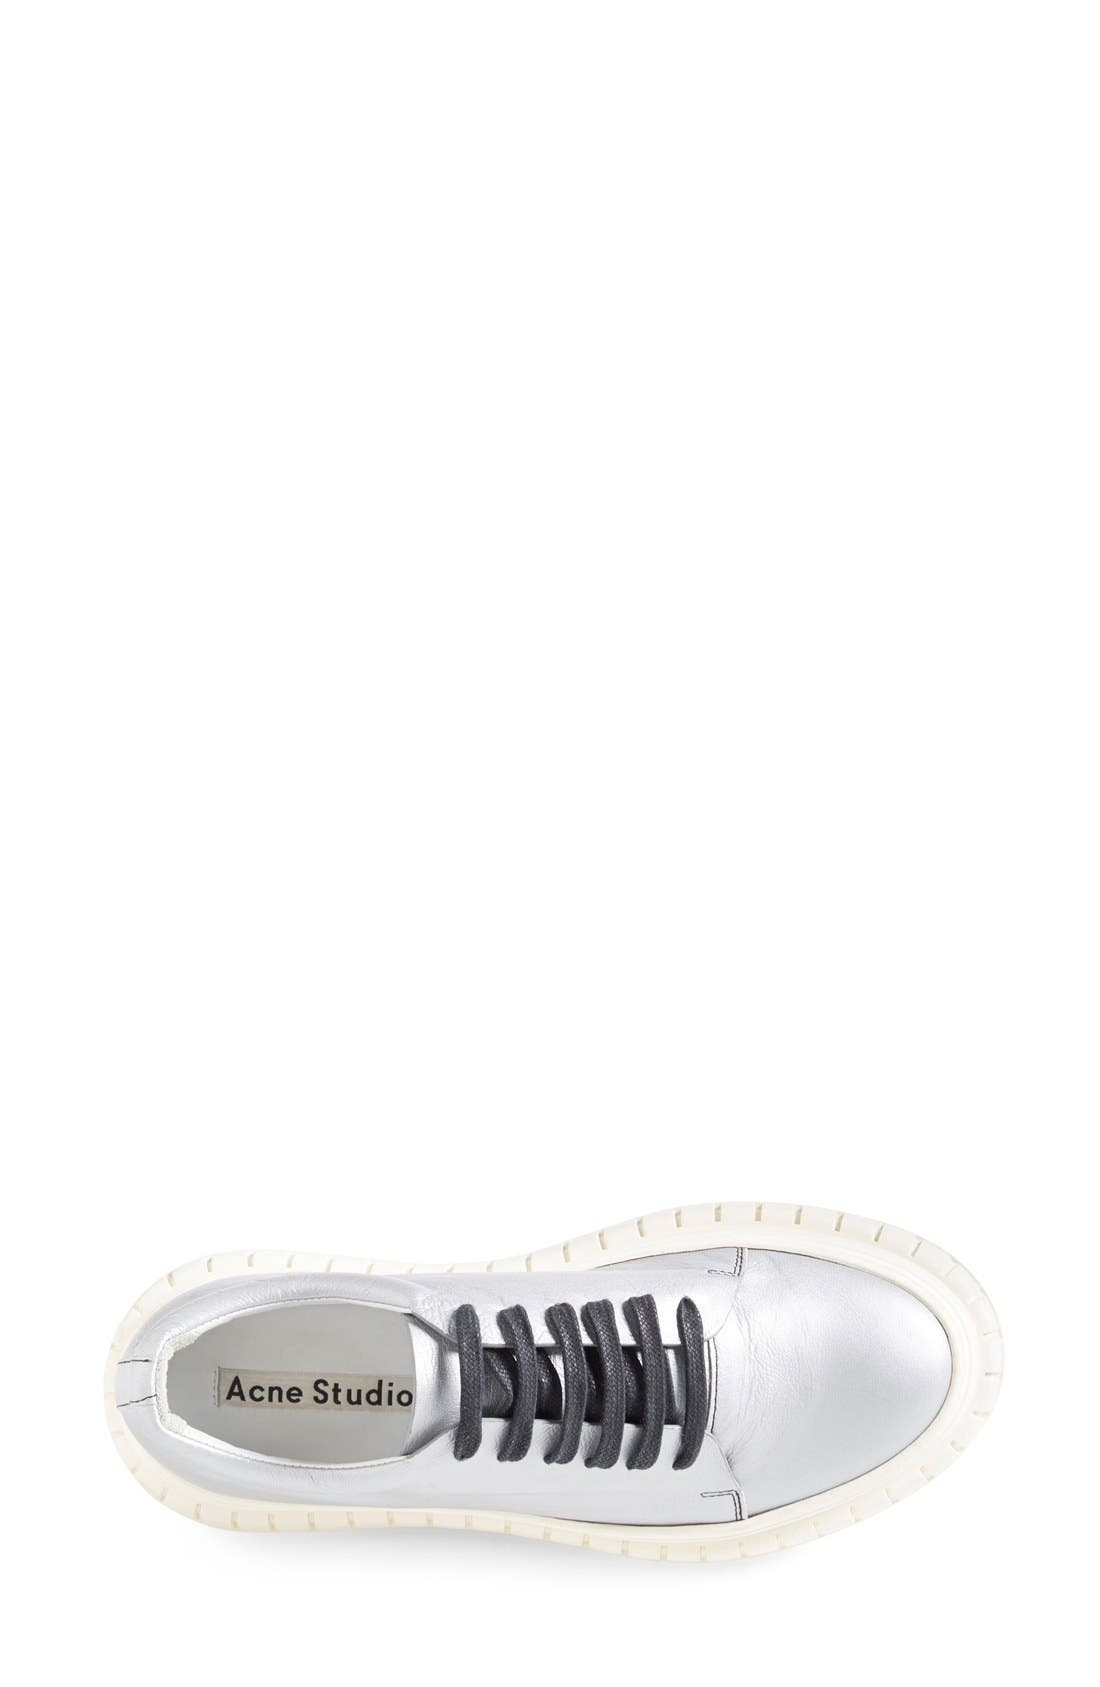 ACNE STUDIOS,                             ACNE Studio 'Saddy' Platform Sneaker,                             Alternate thumbnail 4, color,                             040